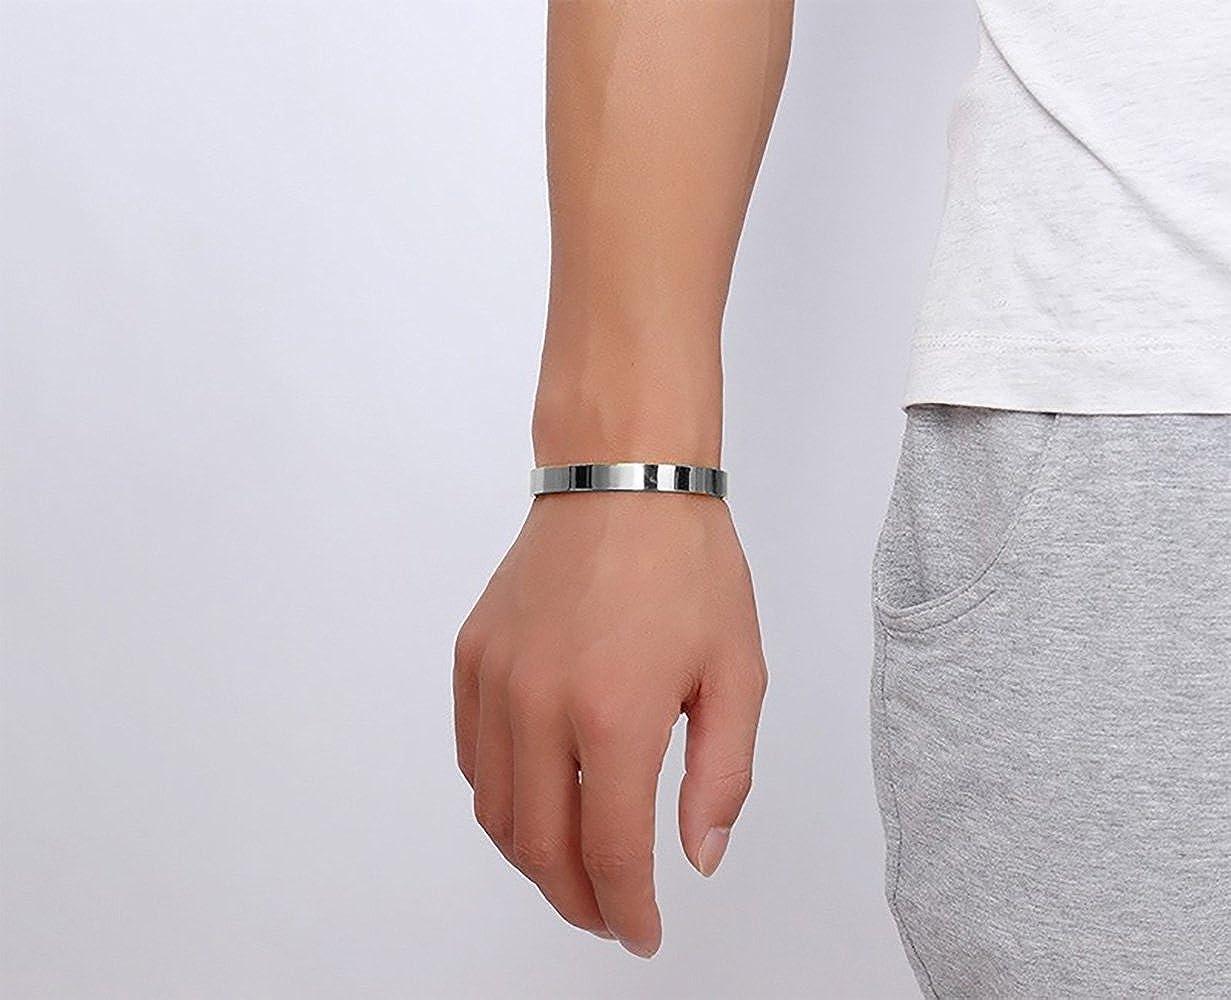 Stainless Steel Cuff Bangle Bracelet Link ID Bracelet Custom Engraving Customized Name ID Men Women